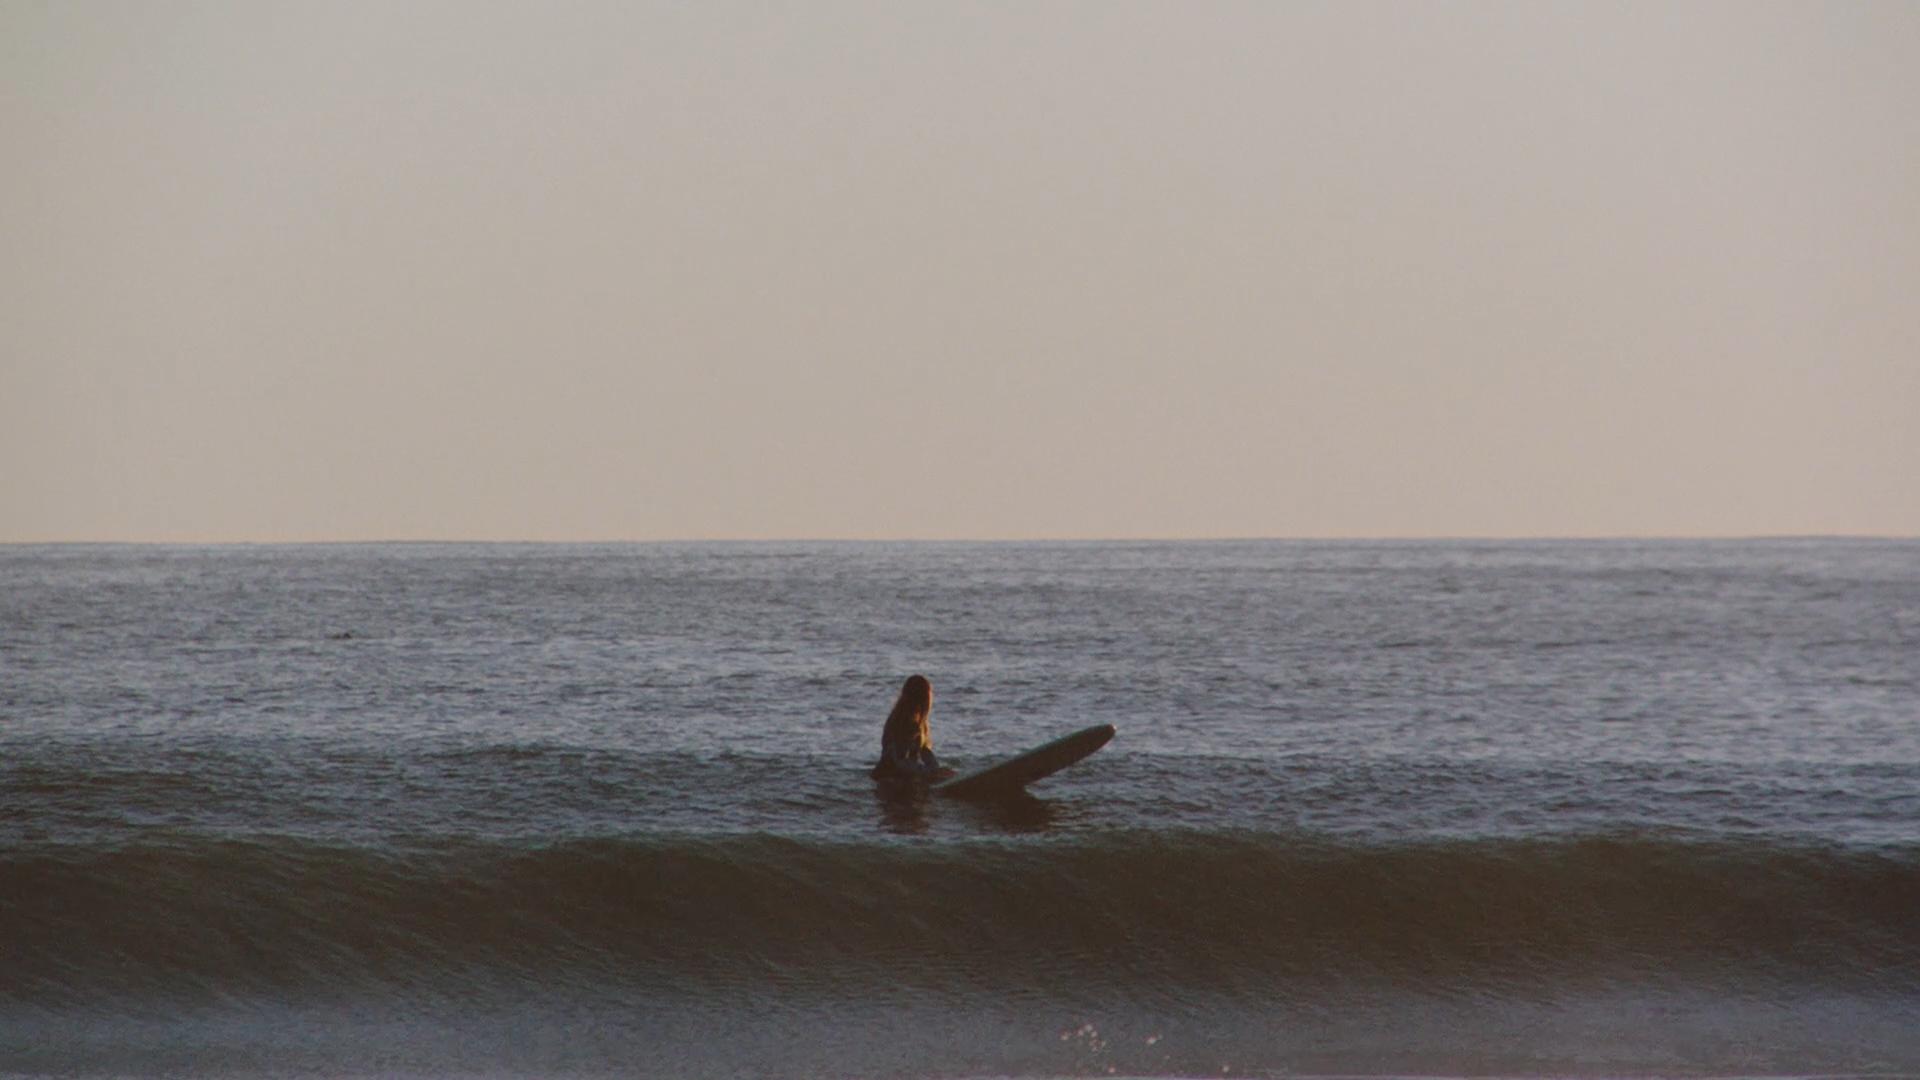 Dean Goes Surfing - Still 03 / dir. Caitlyn Greene / DP Mack Fisher